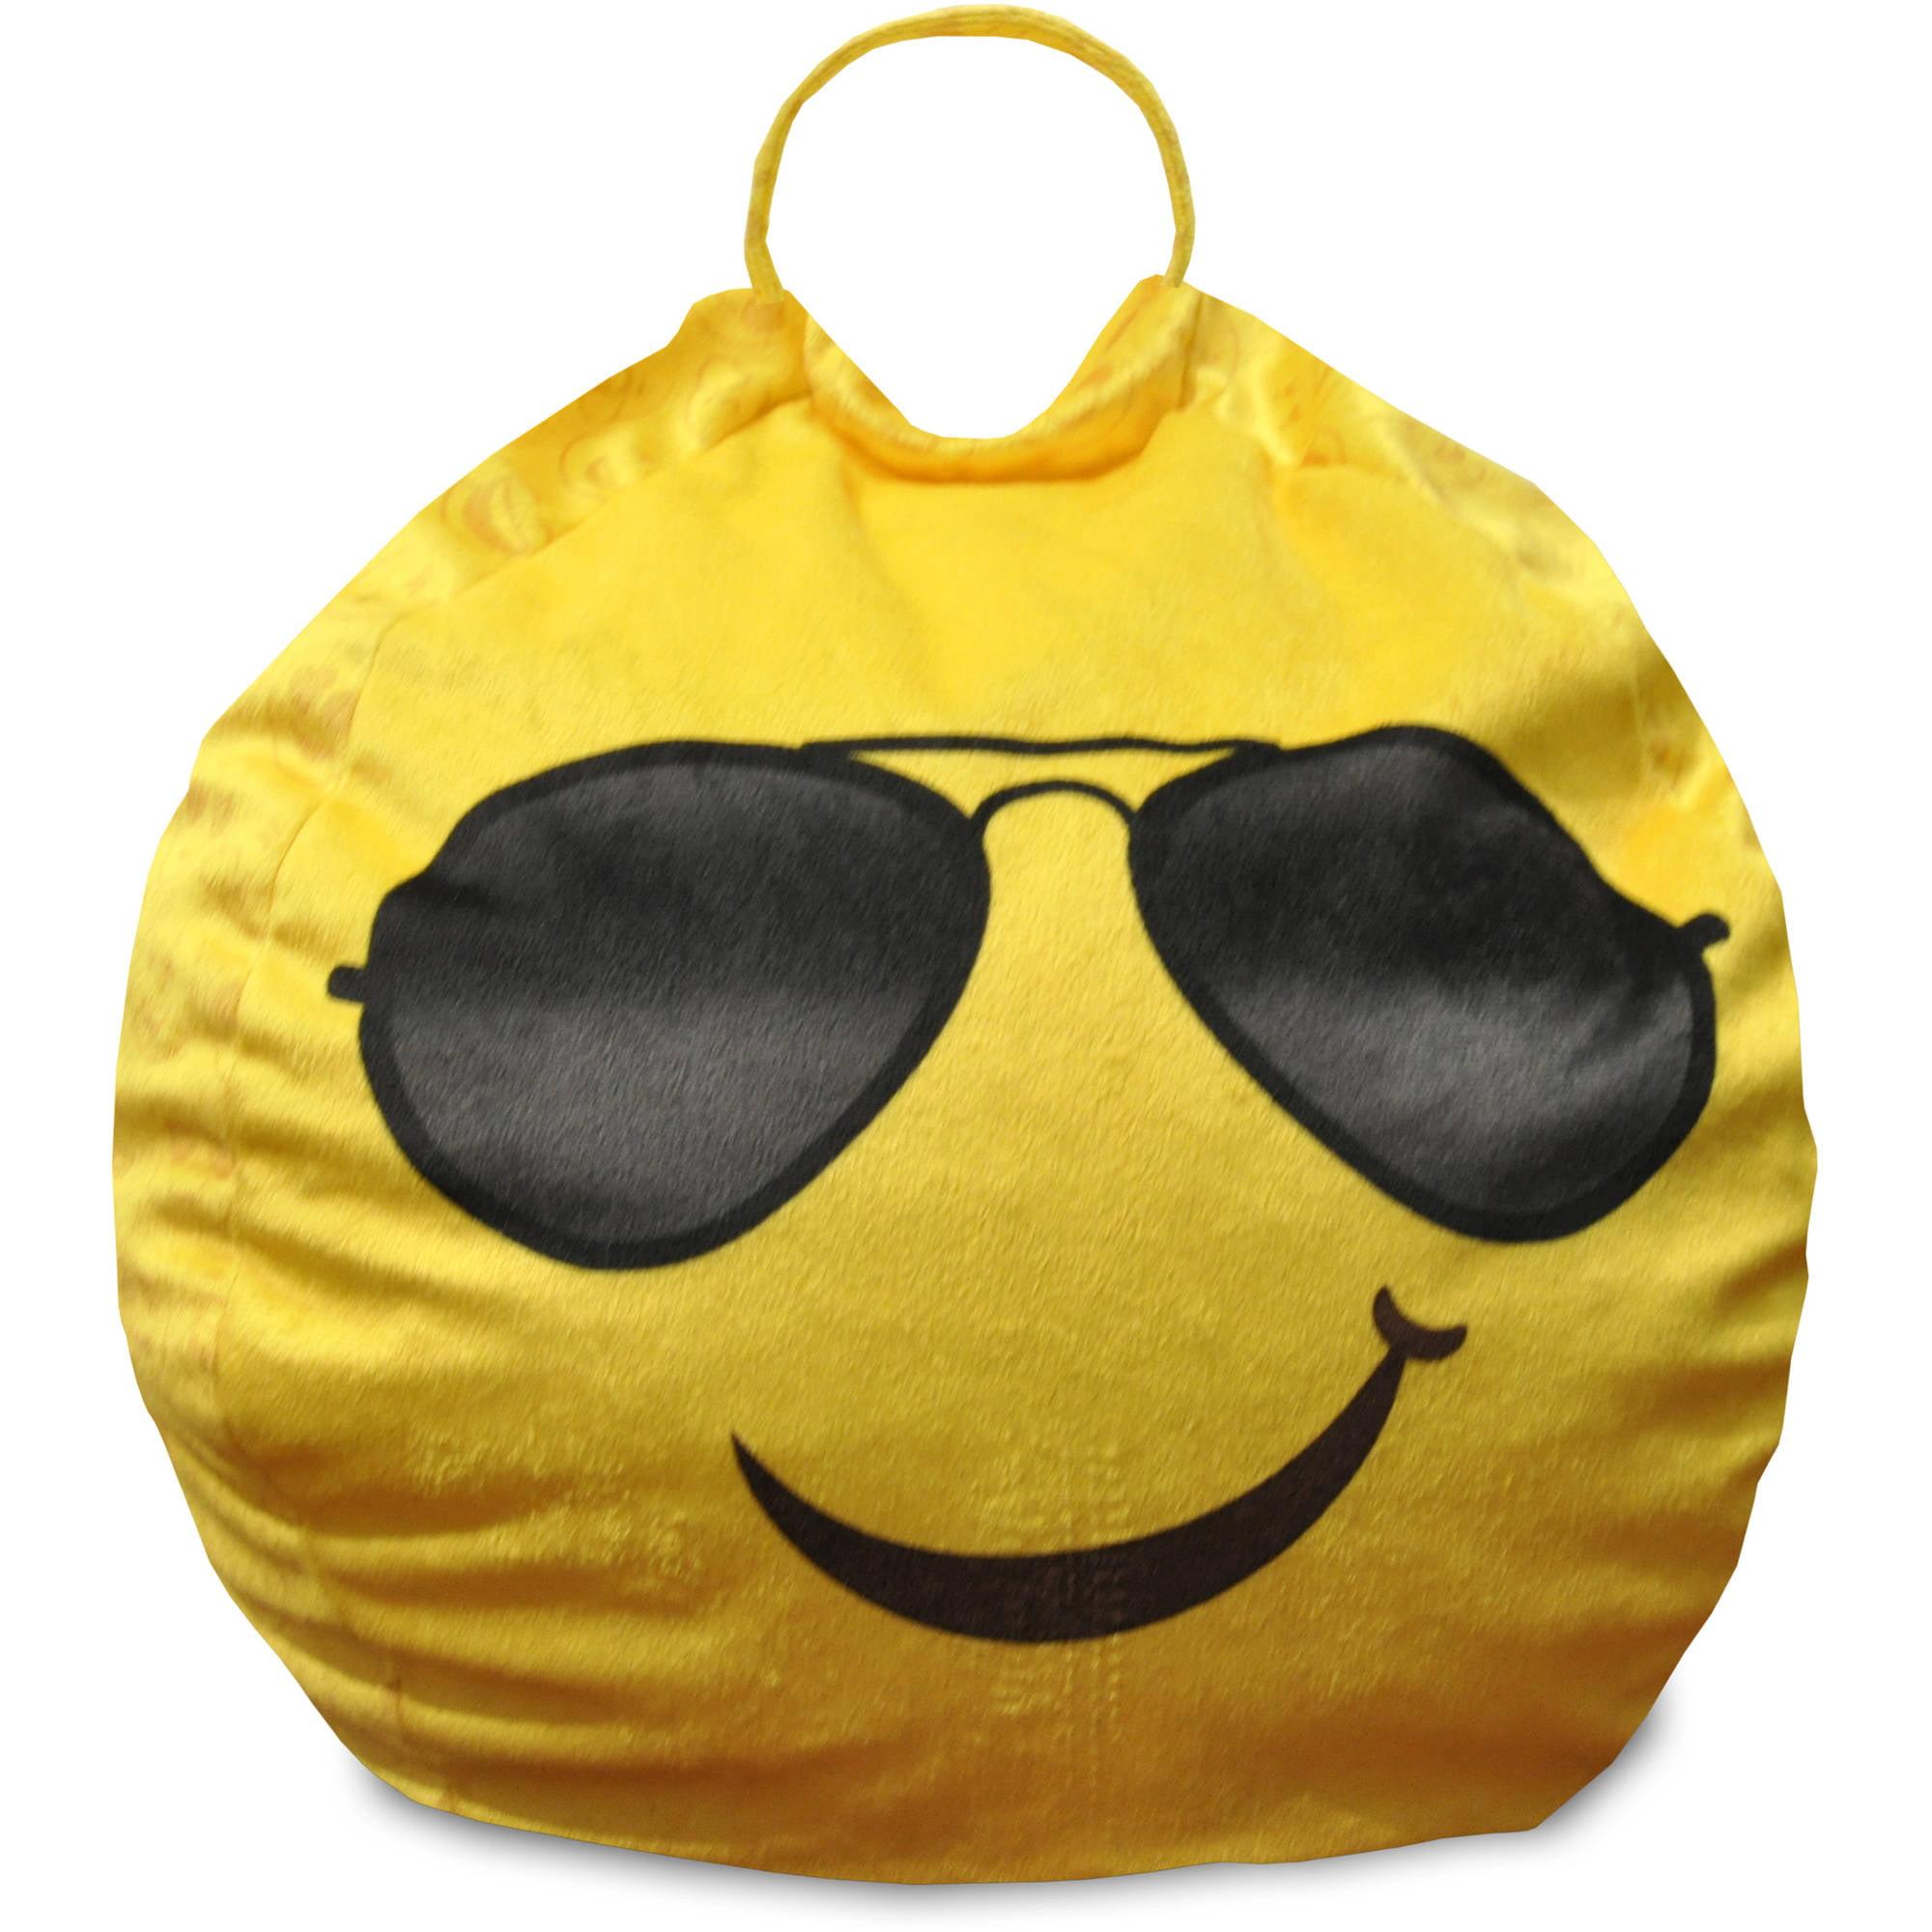 Emoji Pals Cool Shades Mini Bean Bag With Handle